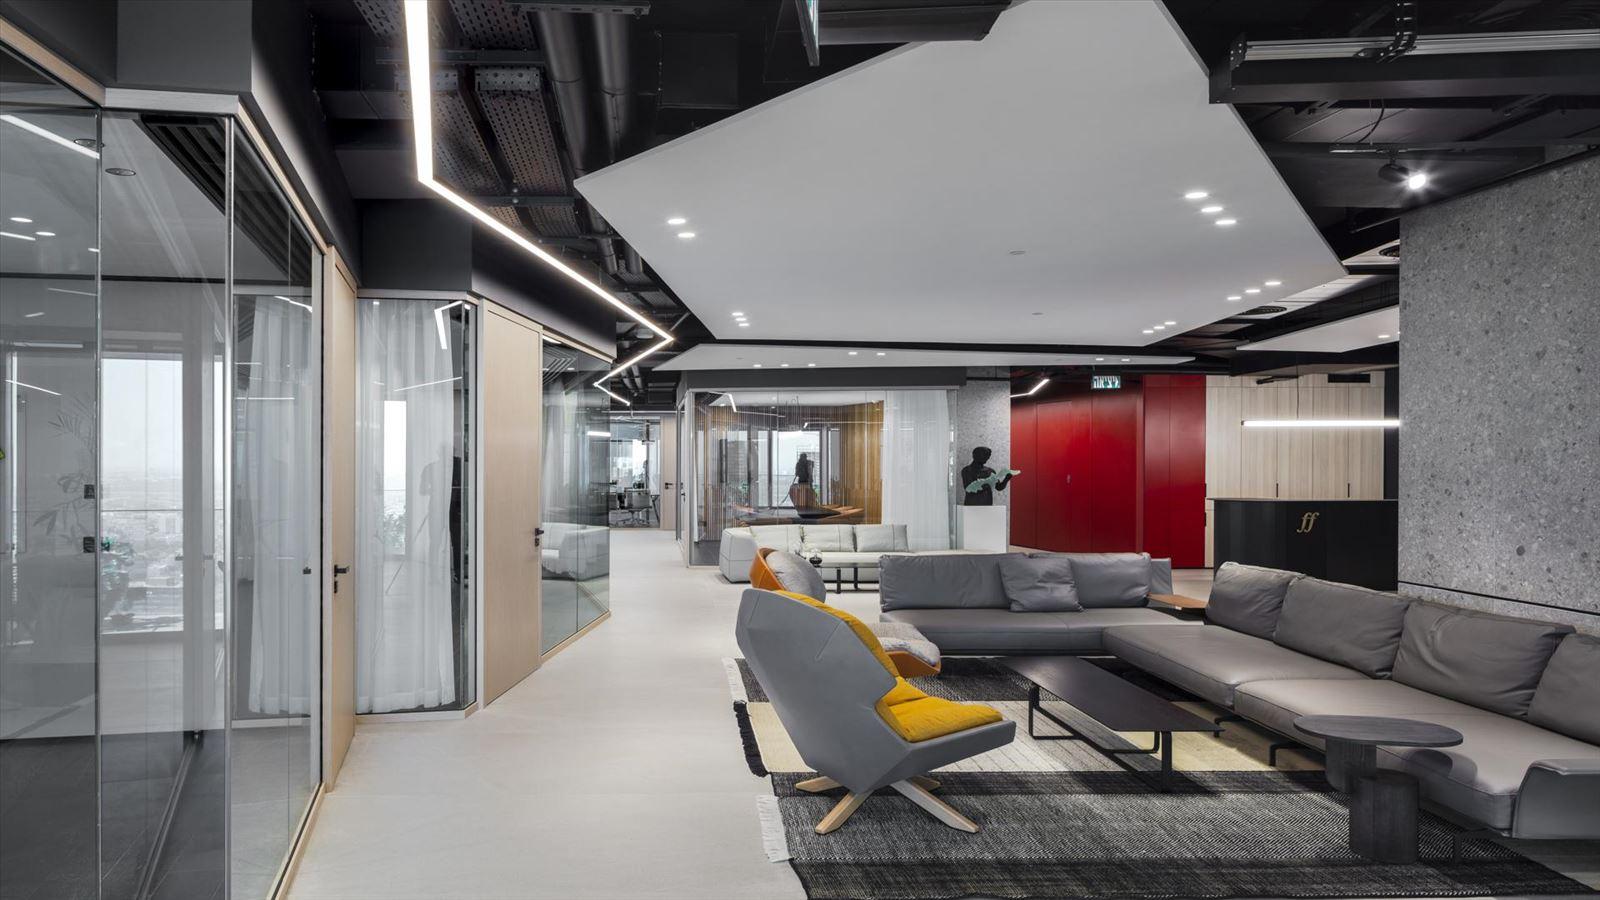 Fortissimo Offices – Tel Aviv שטח המשרד מואר בגופי תאורה של דורי קמחי